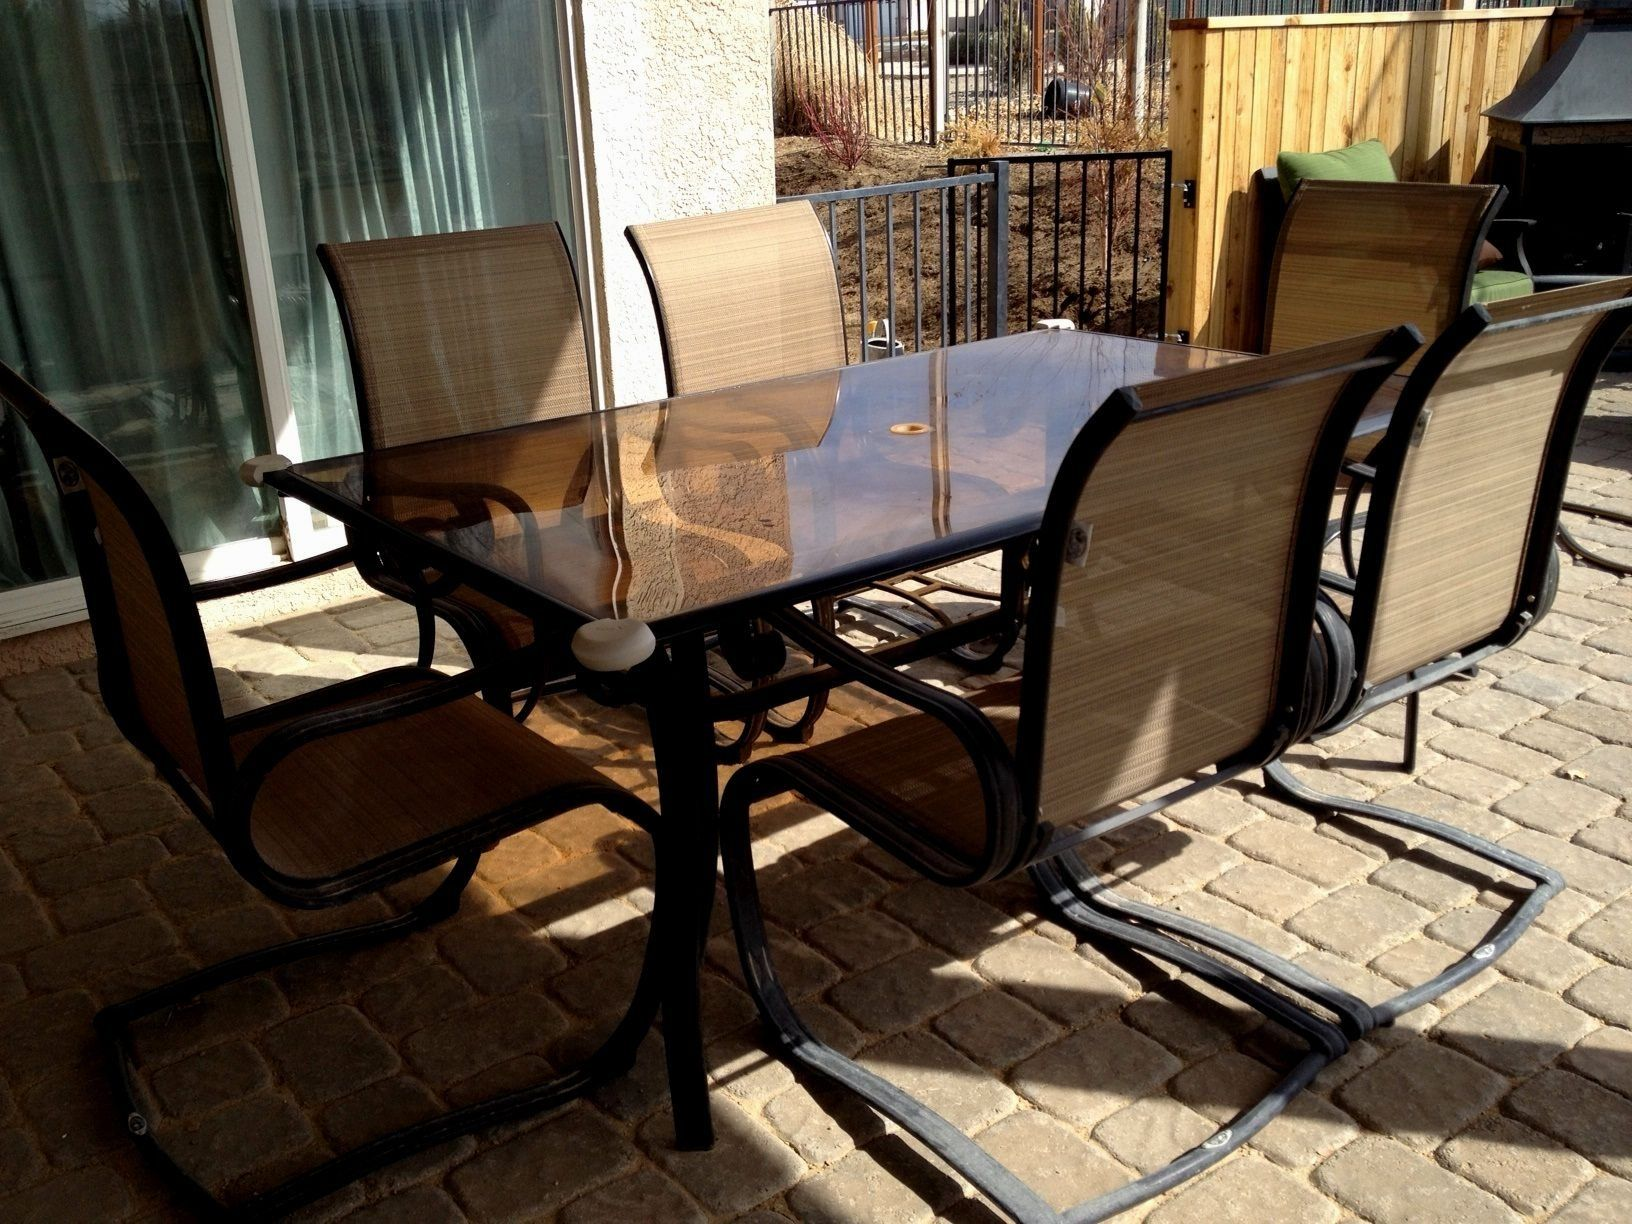 Craigslist Lakeland Furniture By Owner Spice21 Co Uk